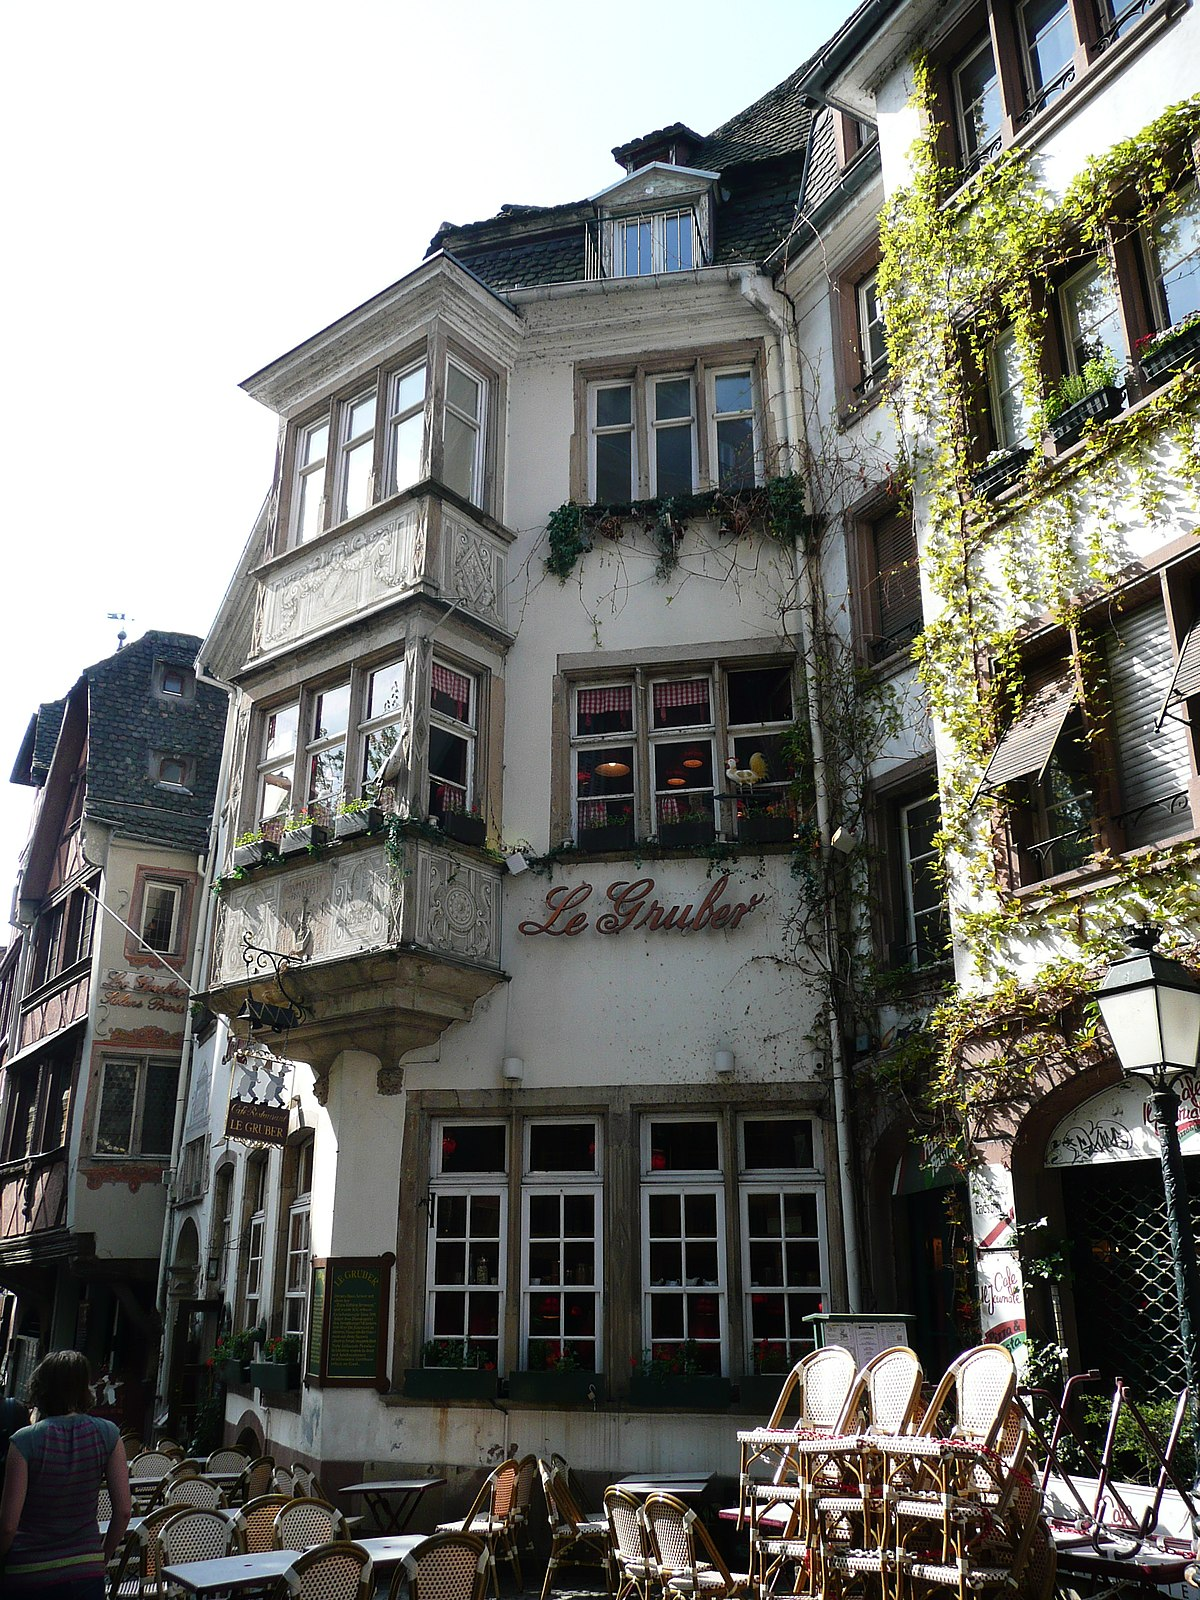 Maison au 11 rue du maroquin strasbourg wikip dia for Rue du miroir strasbourg